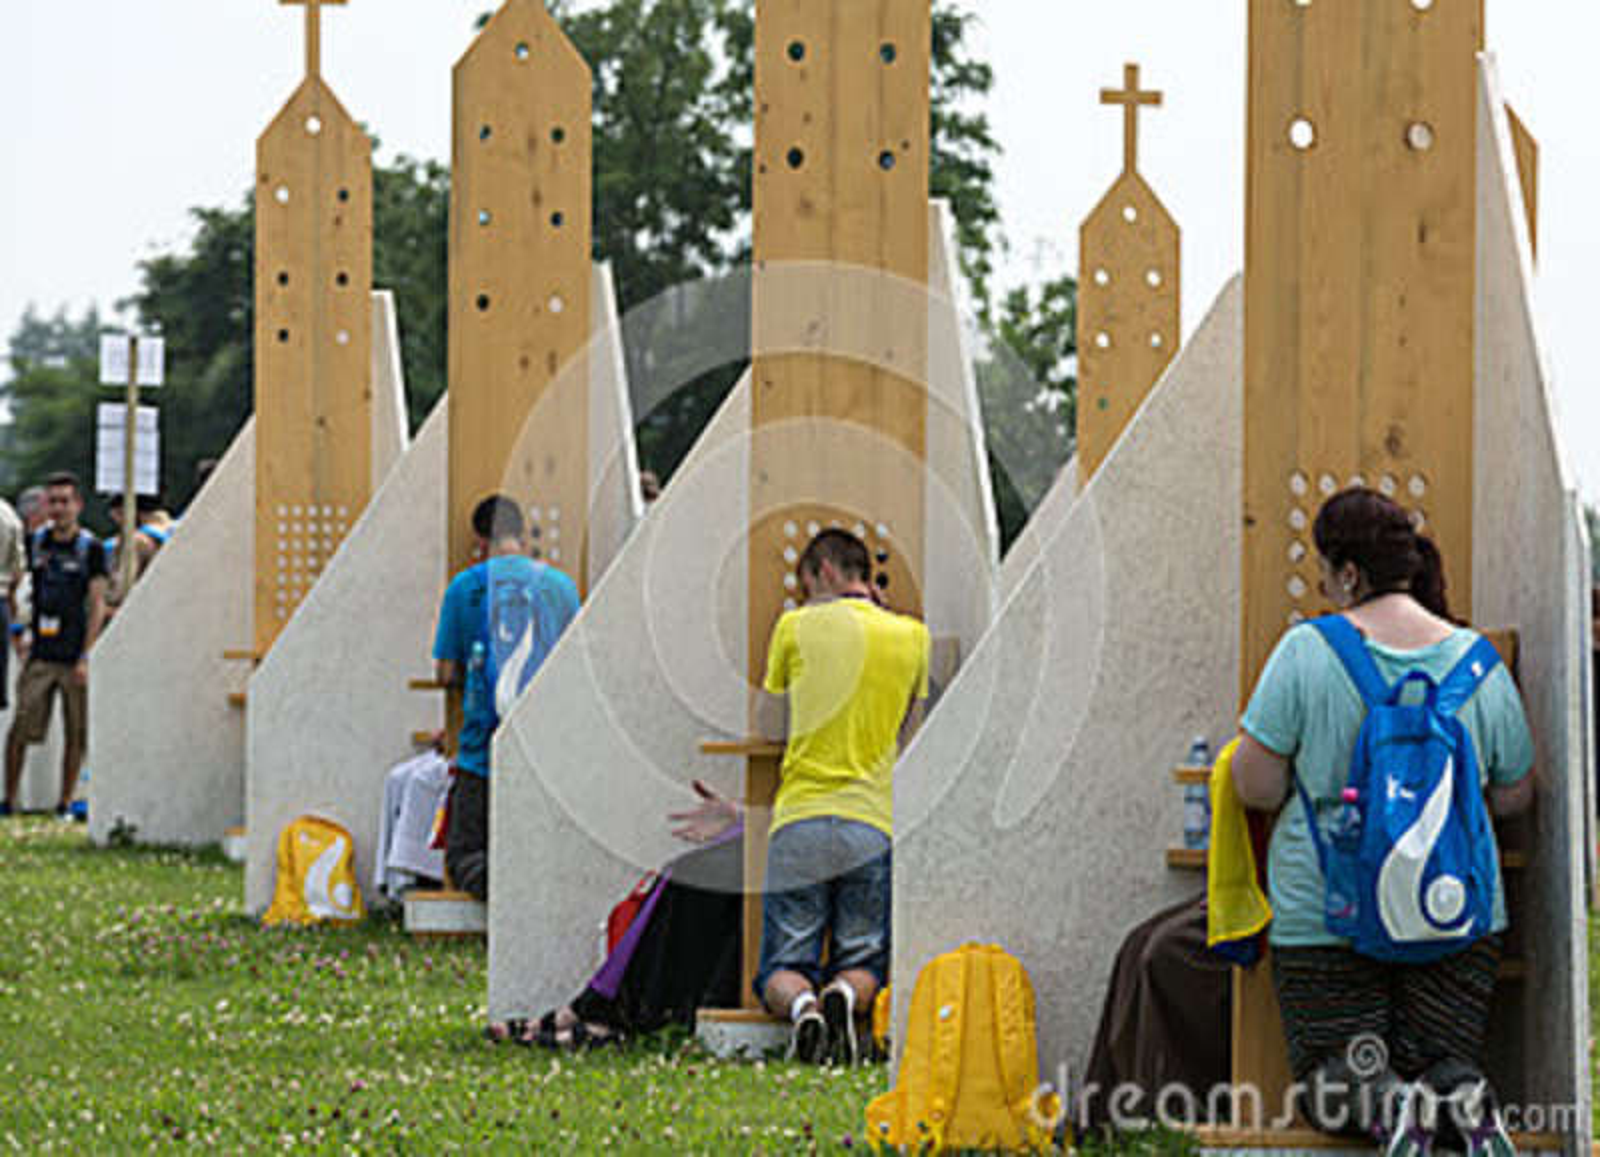 Pilgrims in Zone of Reconciliation at Sanctuary of Divine Mercy in Lagiewniki.